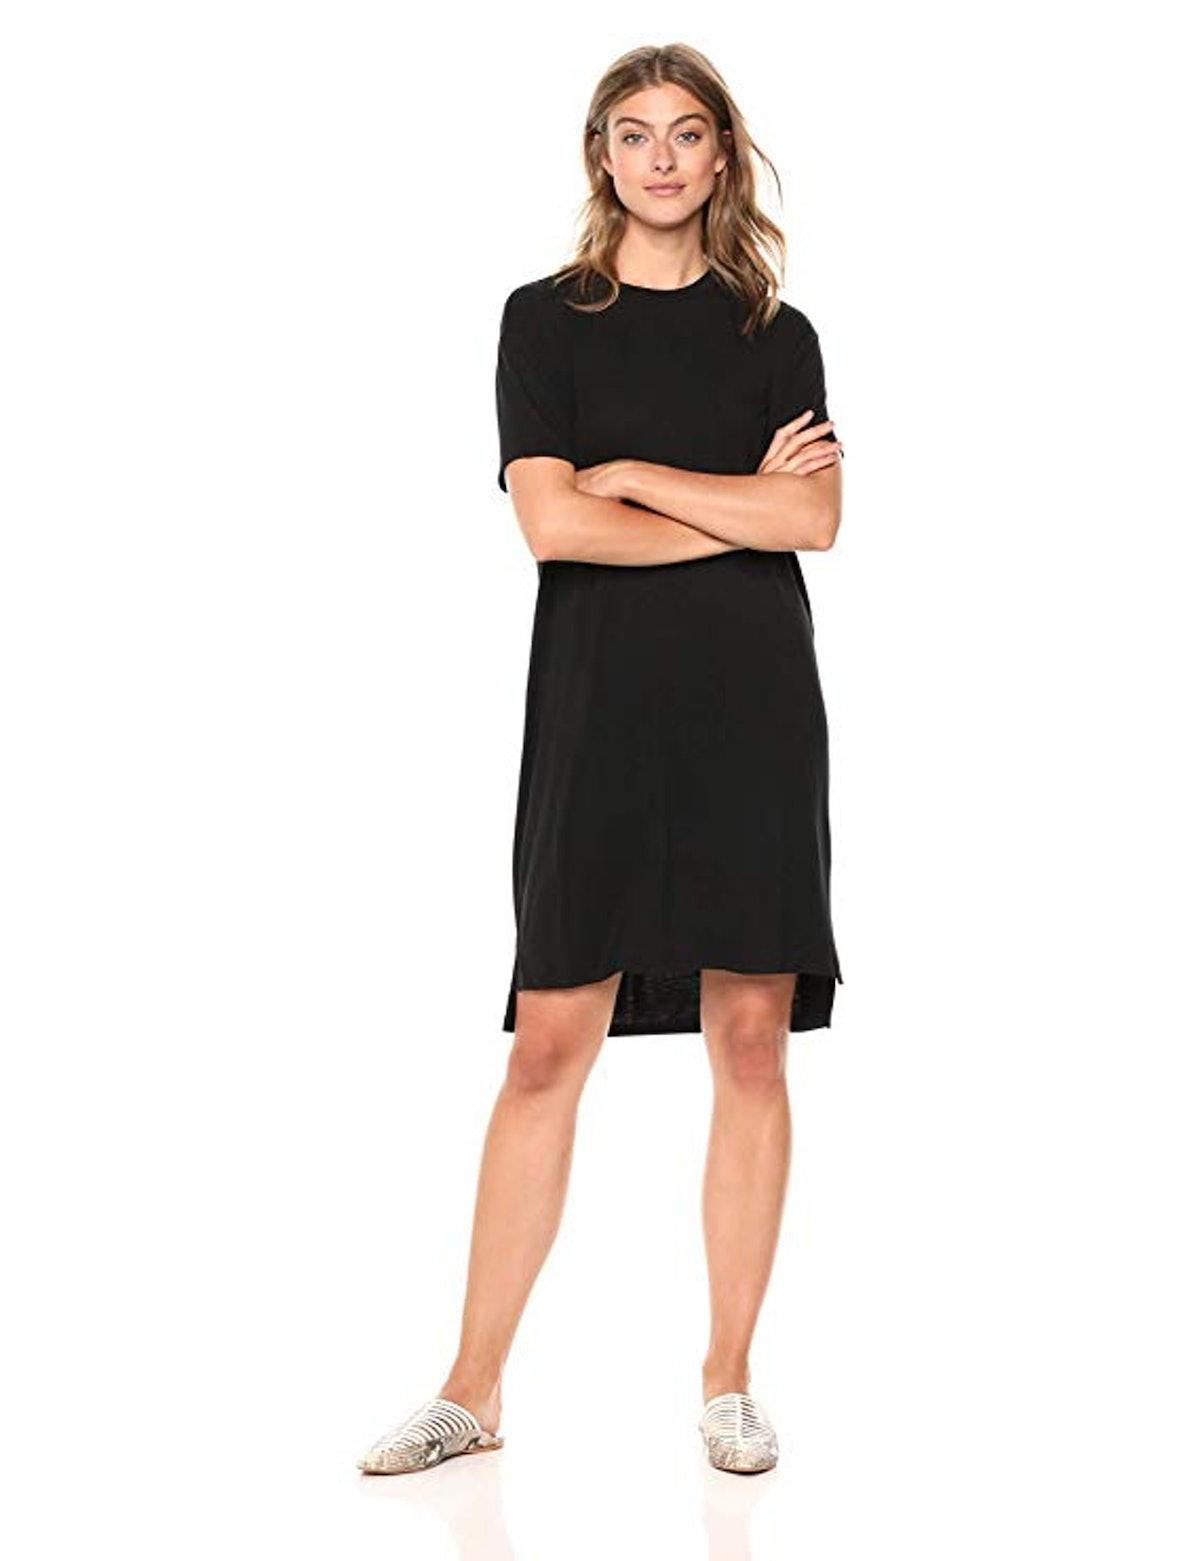 Daily Ritual Women's Short-Sleeve T-Shirt Dress